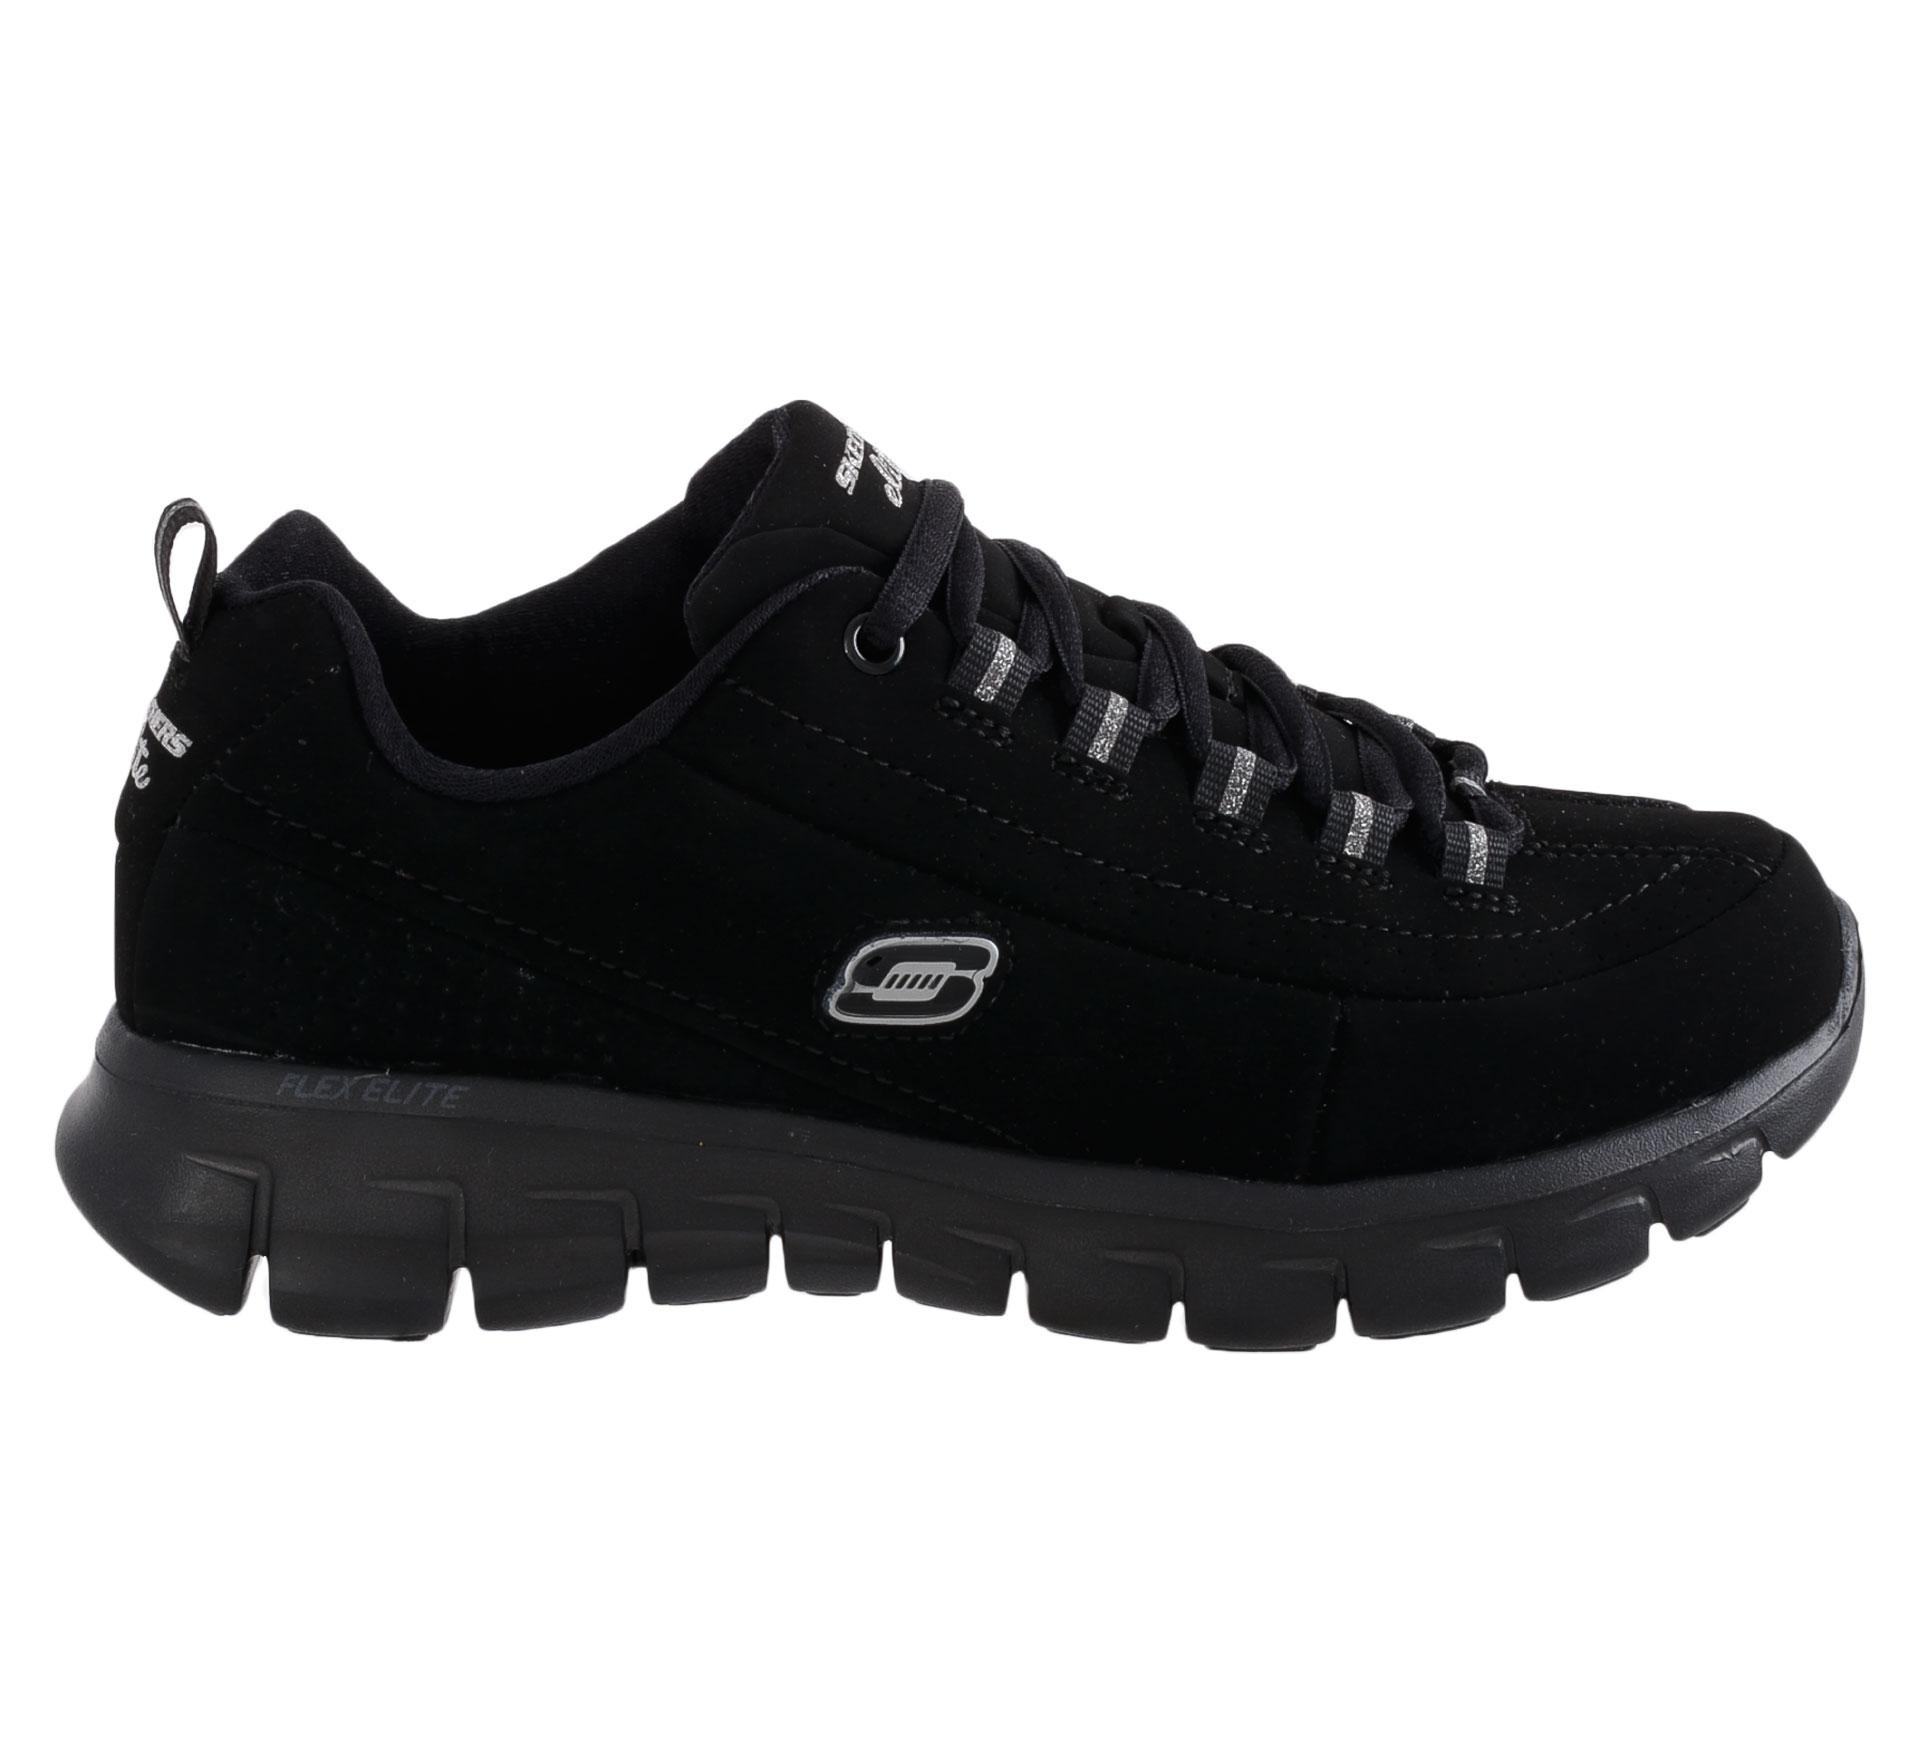 Skechers Synergy-Trendsetter Fitness Schoenen Dames zwart - zilver